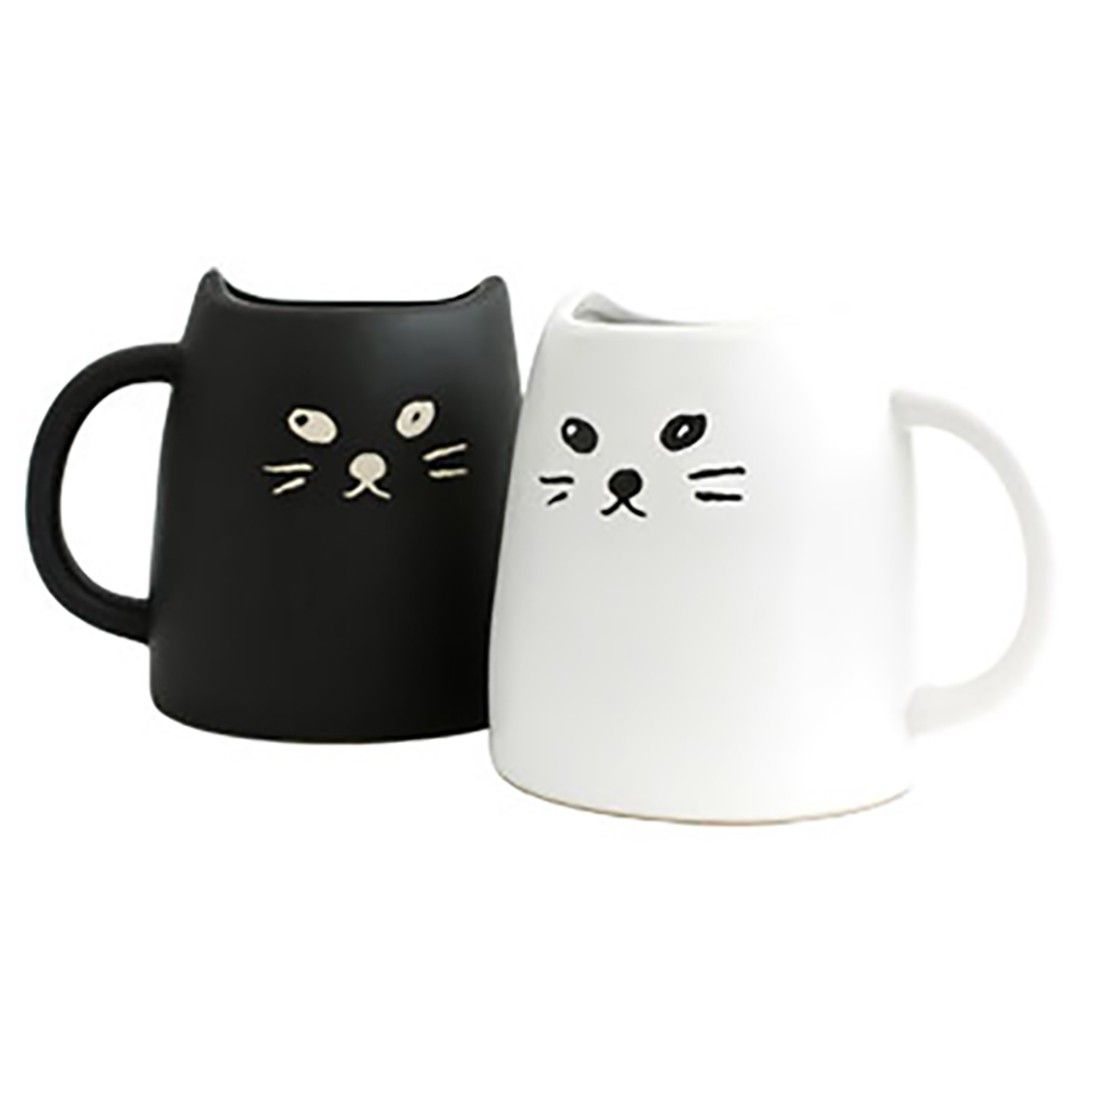 Black white cat mug set cat lover unite these two cats